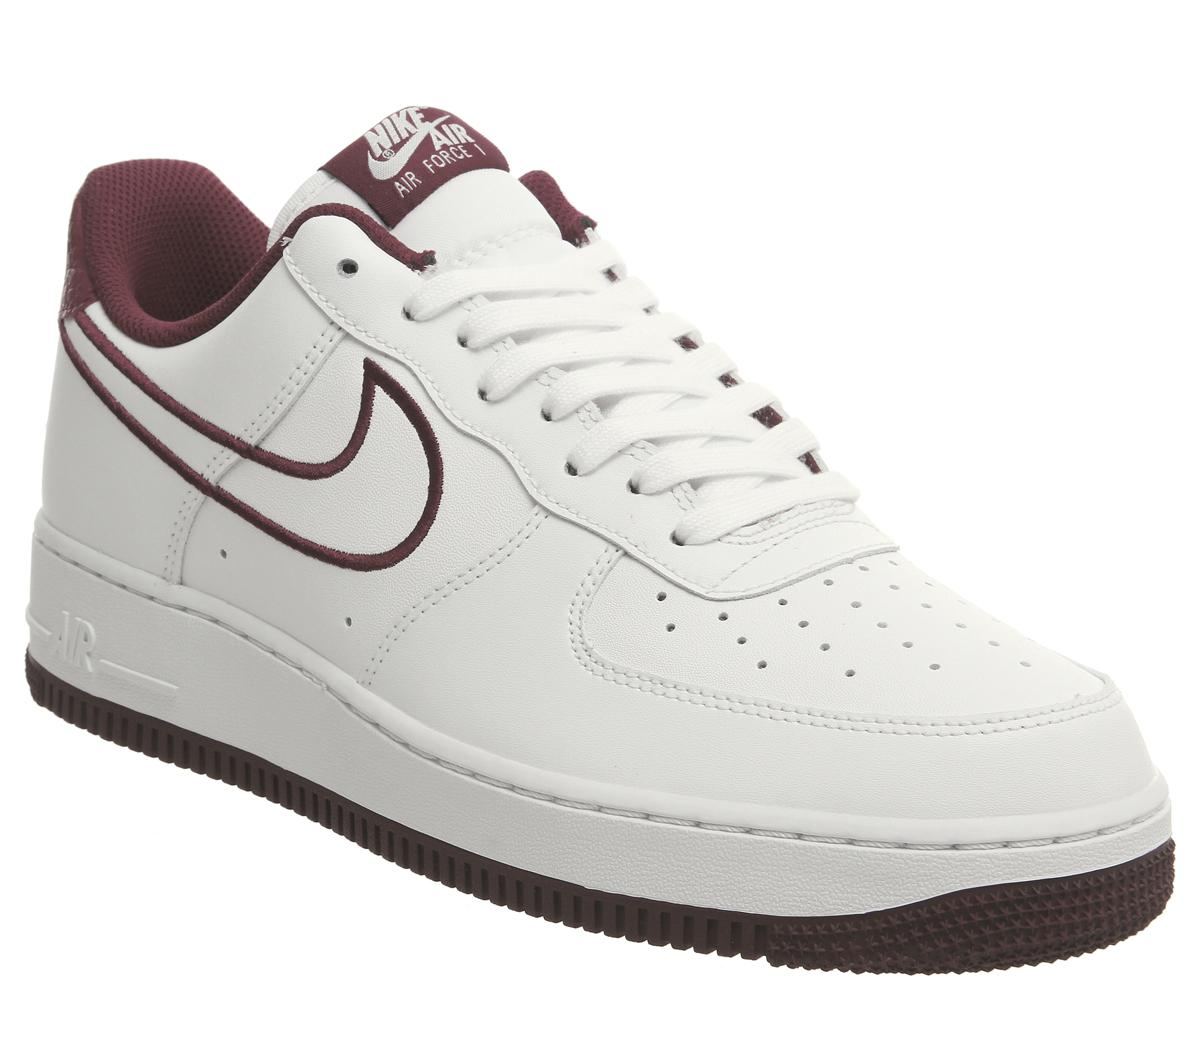 Nike Air Force 1 07 Trainers White Team